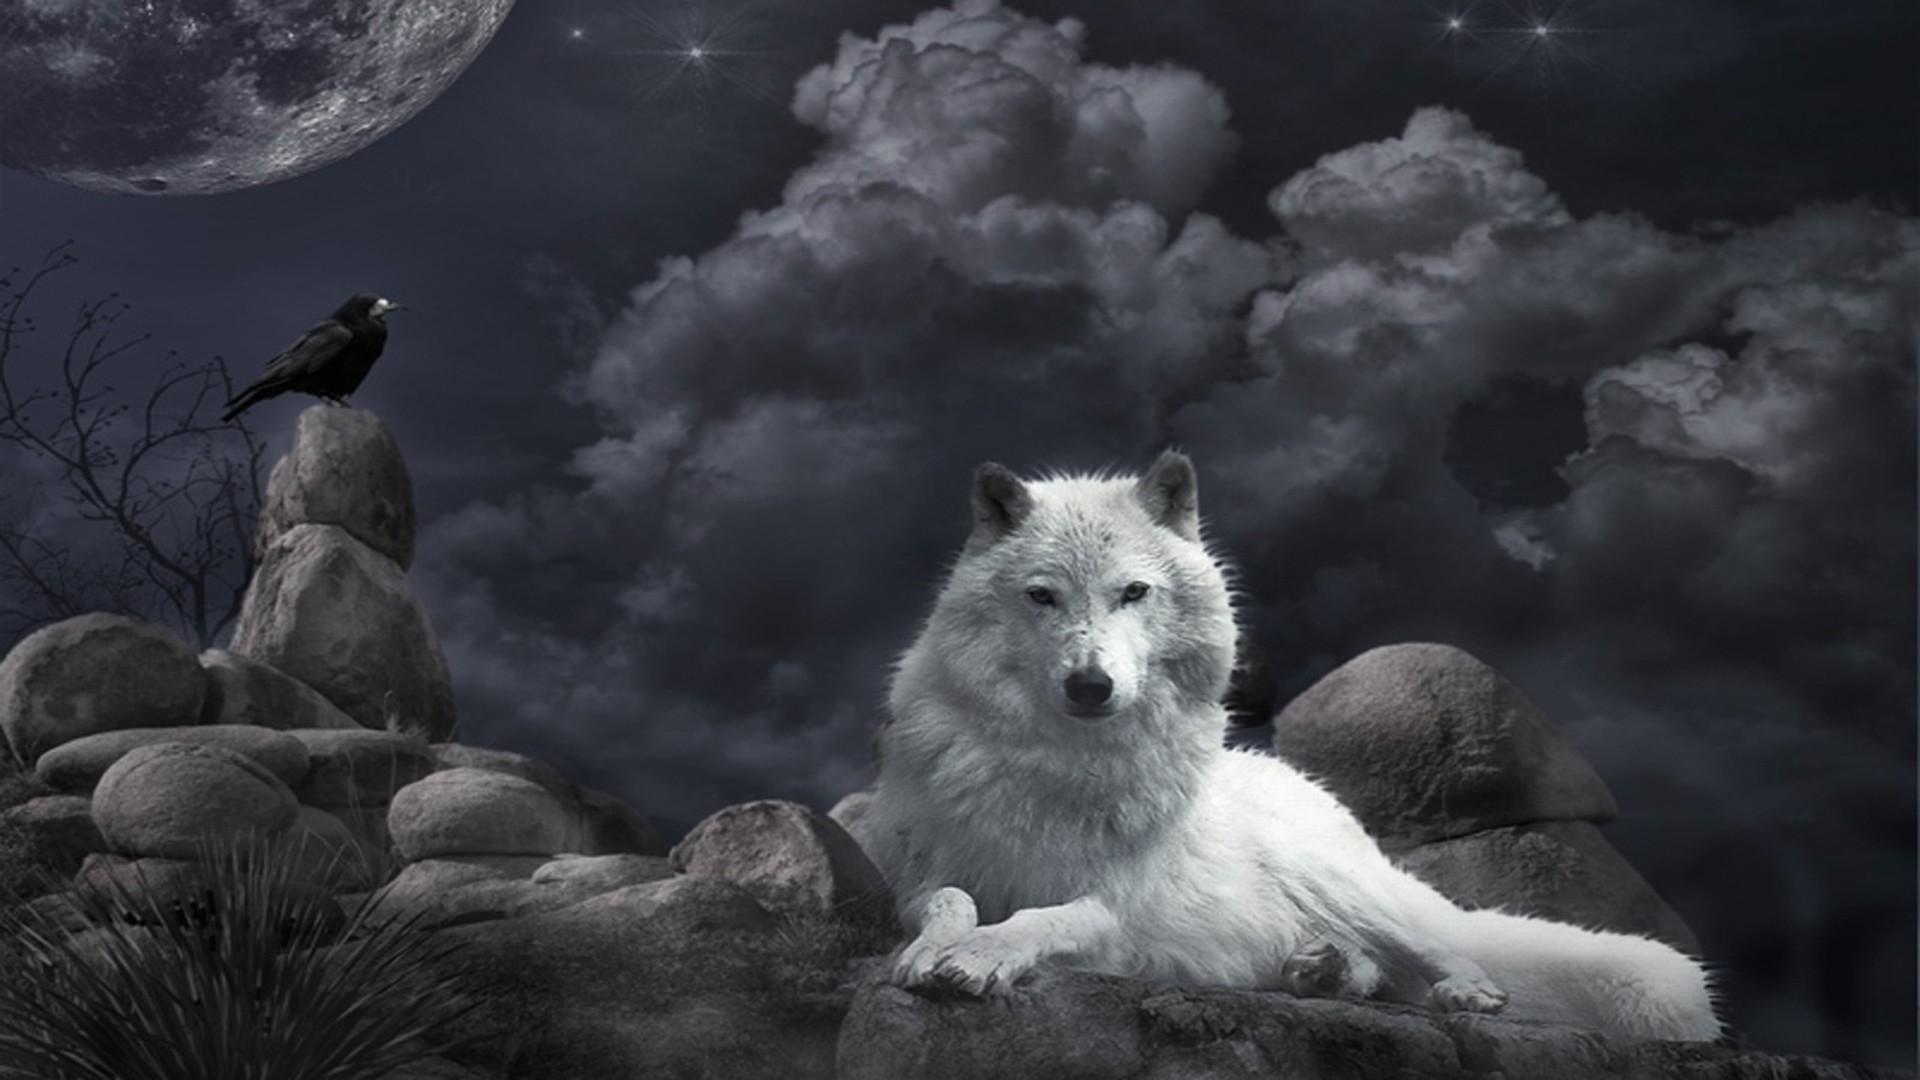 Wolf Wallpaper 1080p For Desktop Wallpaper 1920 x 1080 px 623.08 KB black  moon iphone